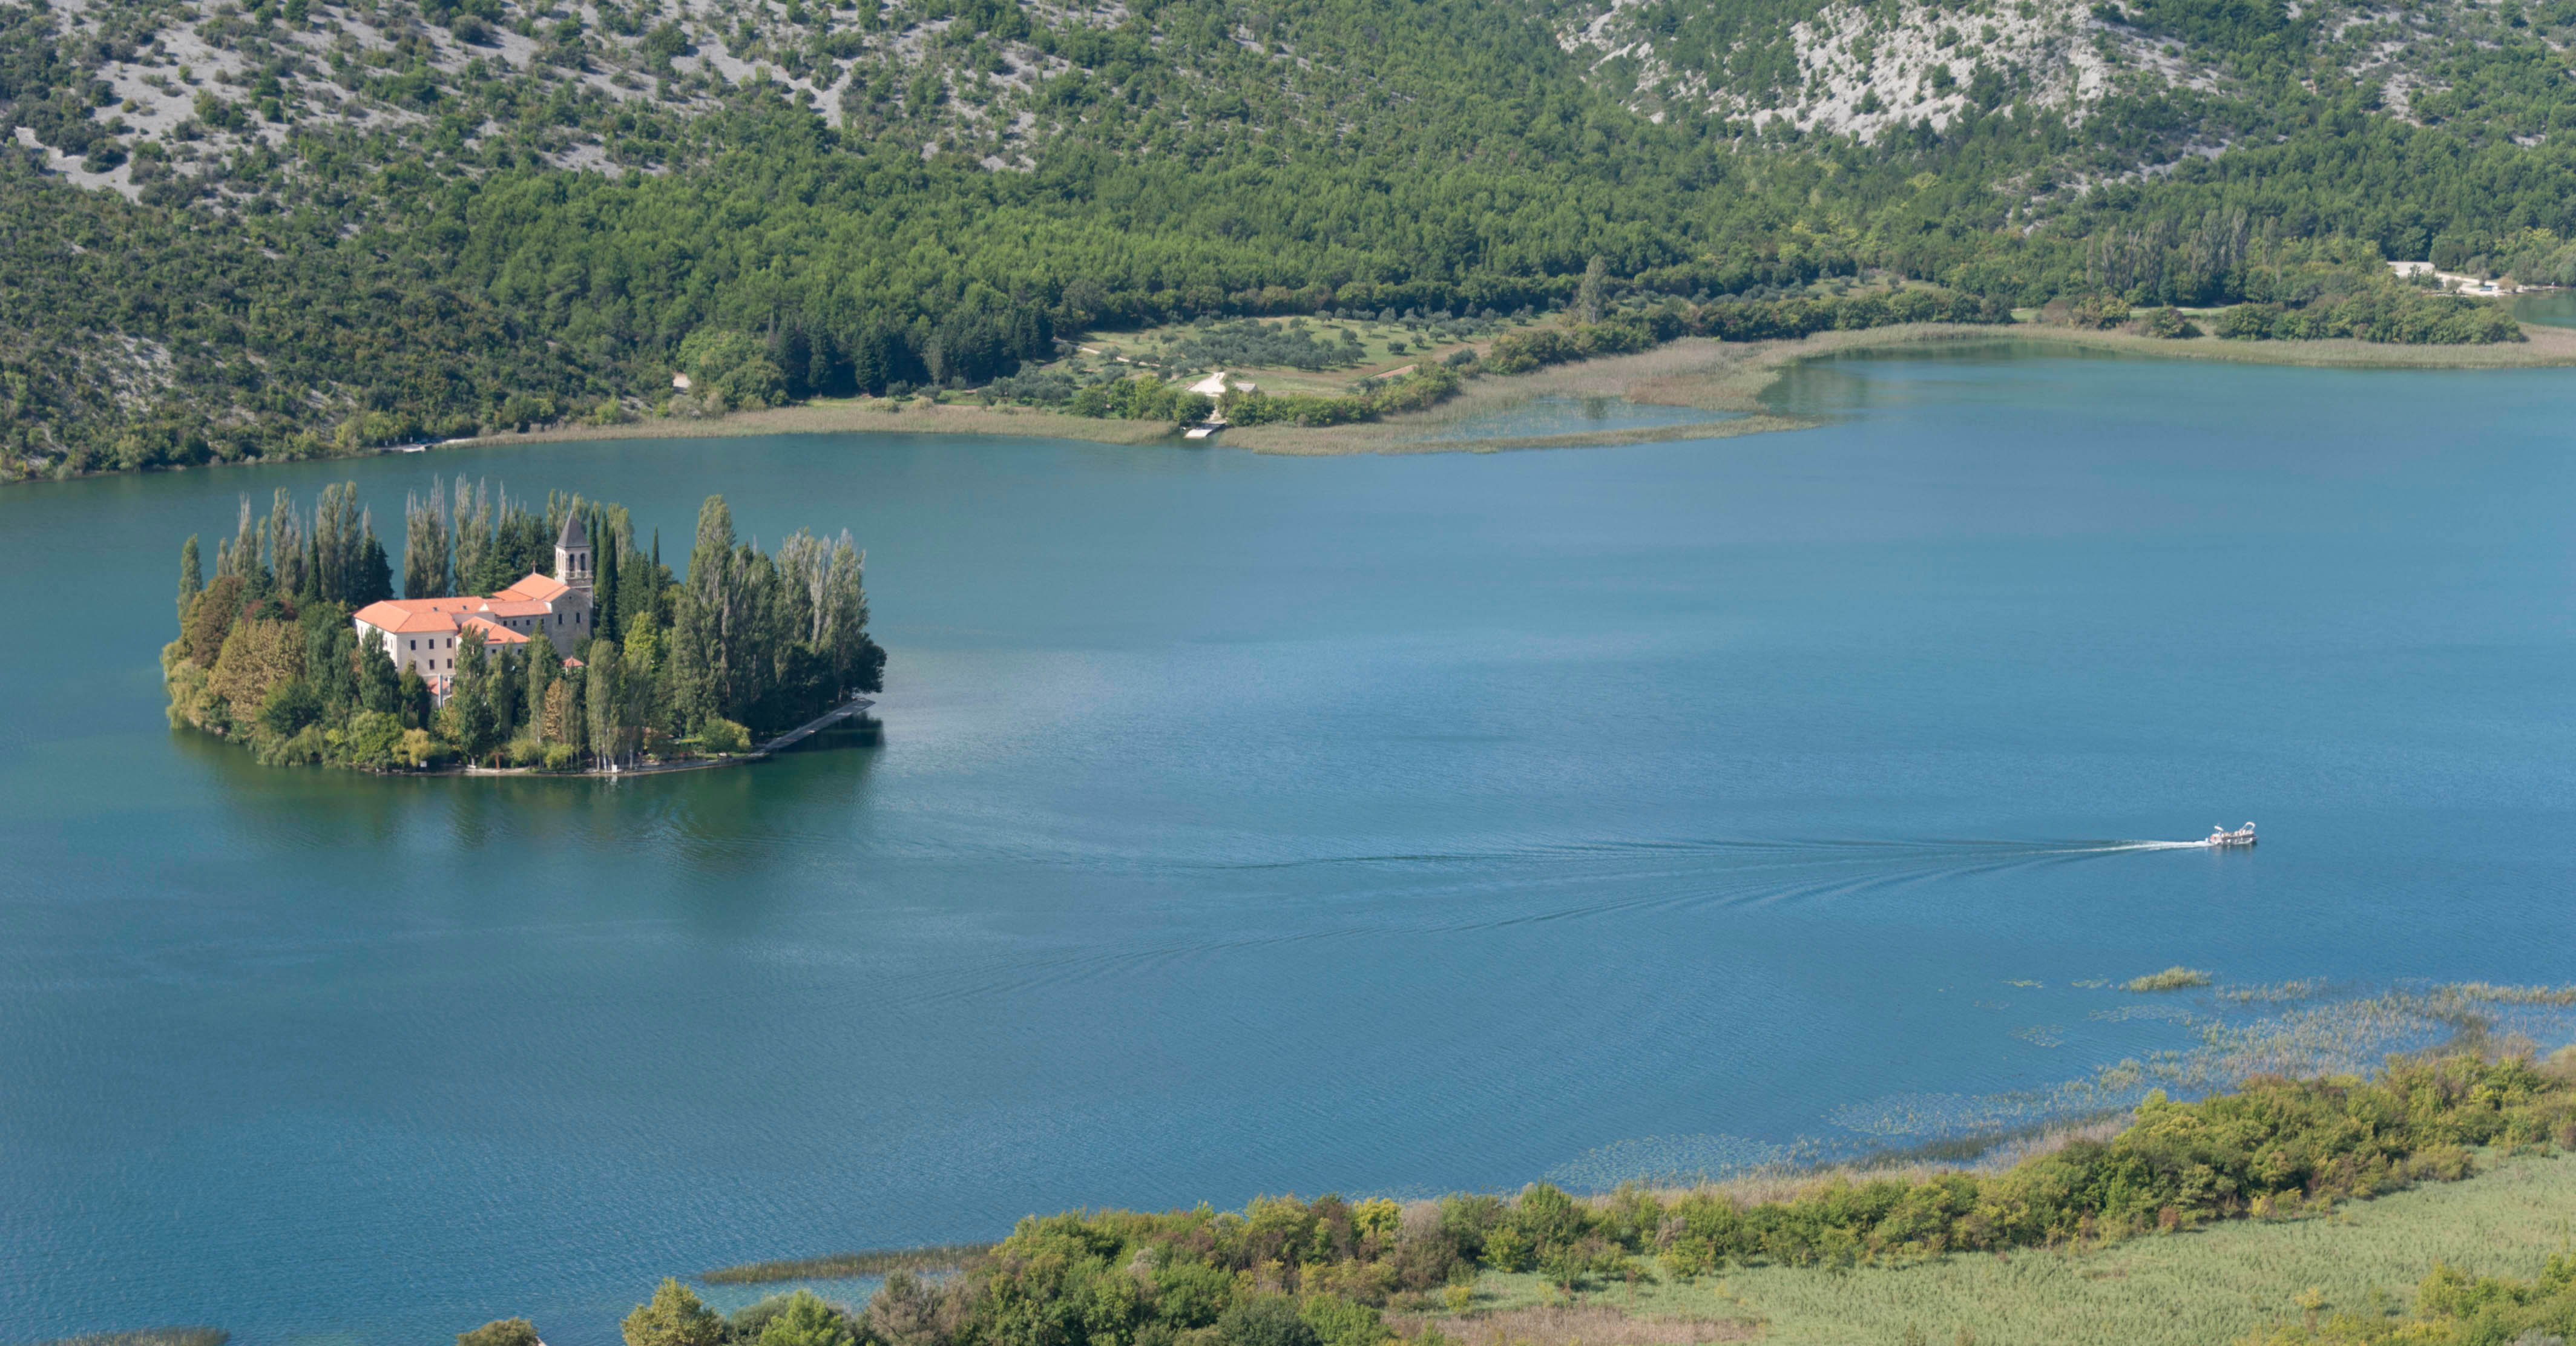 9470-Parc national Krka (Dalmatie du Nord)